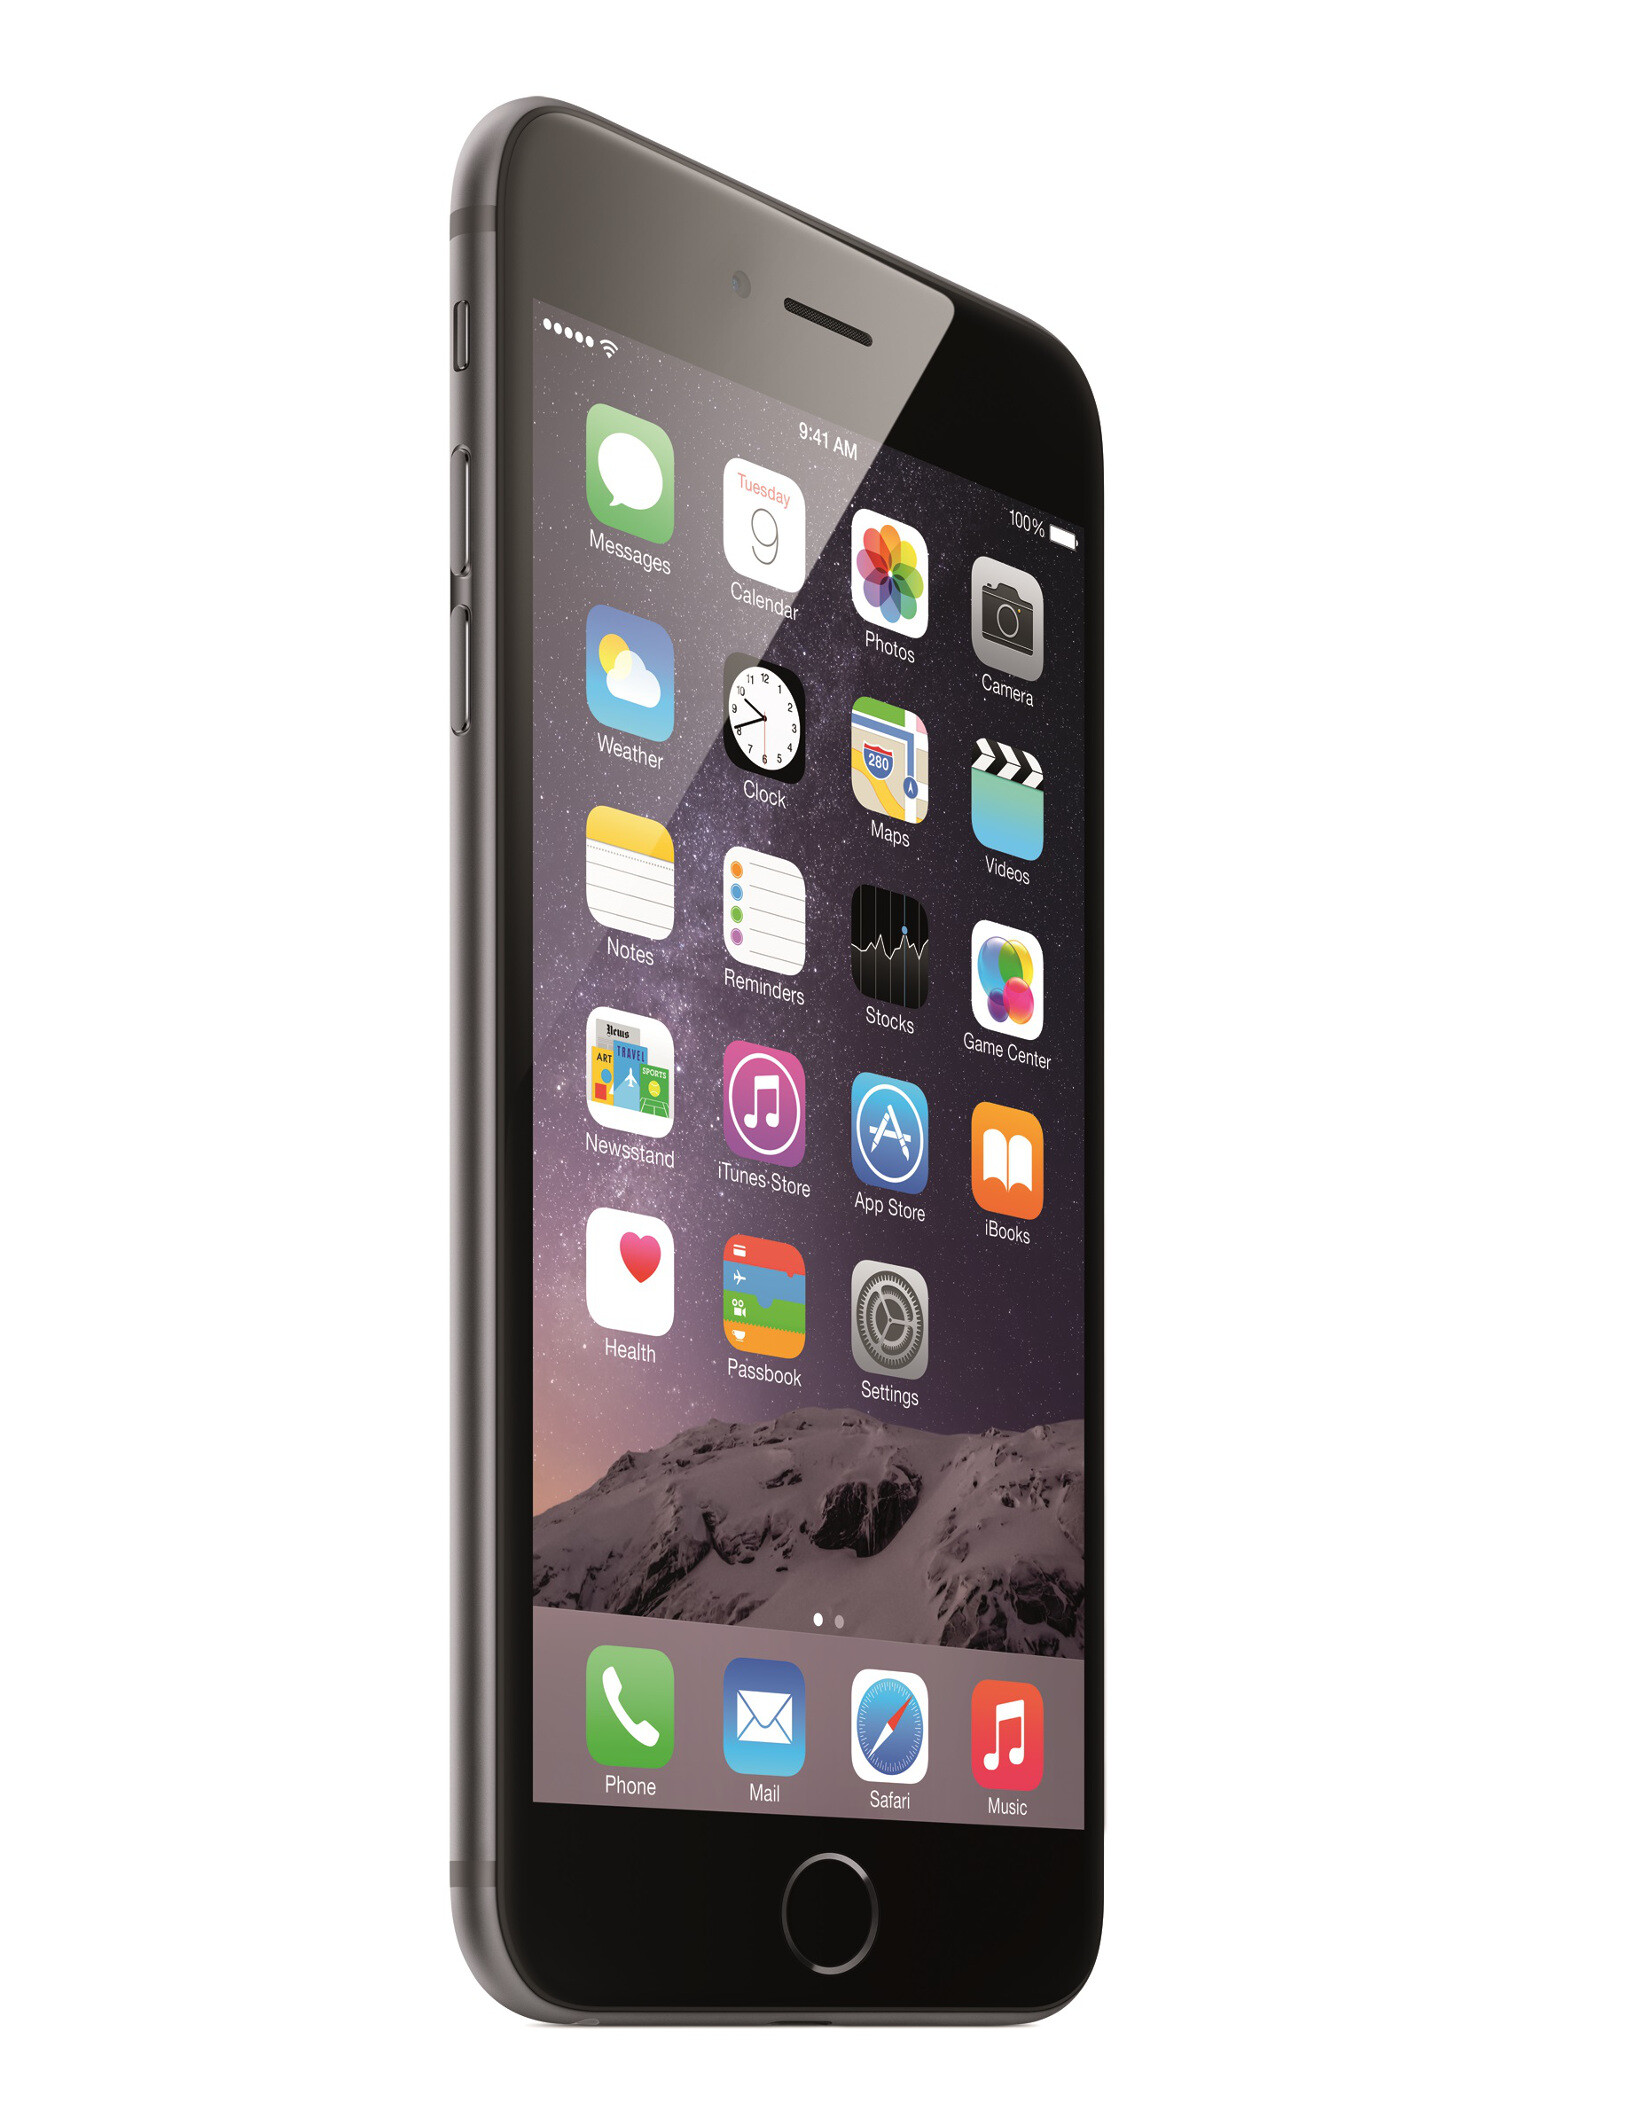 apple iphone 6 plus. Black Bedroom Furniture Sets. Home Design Ideas